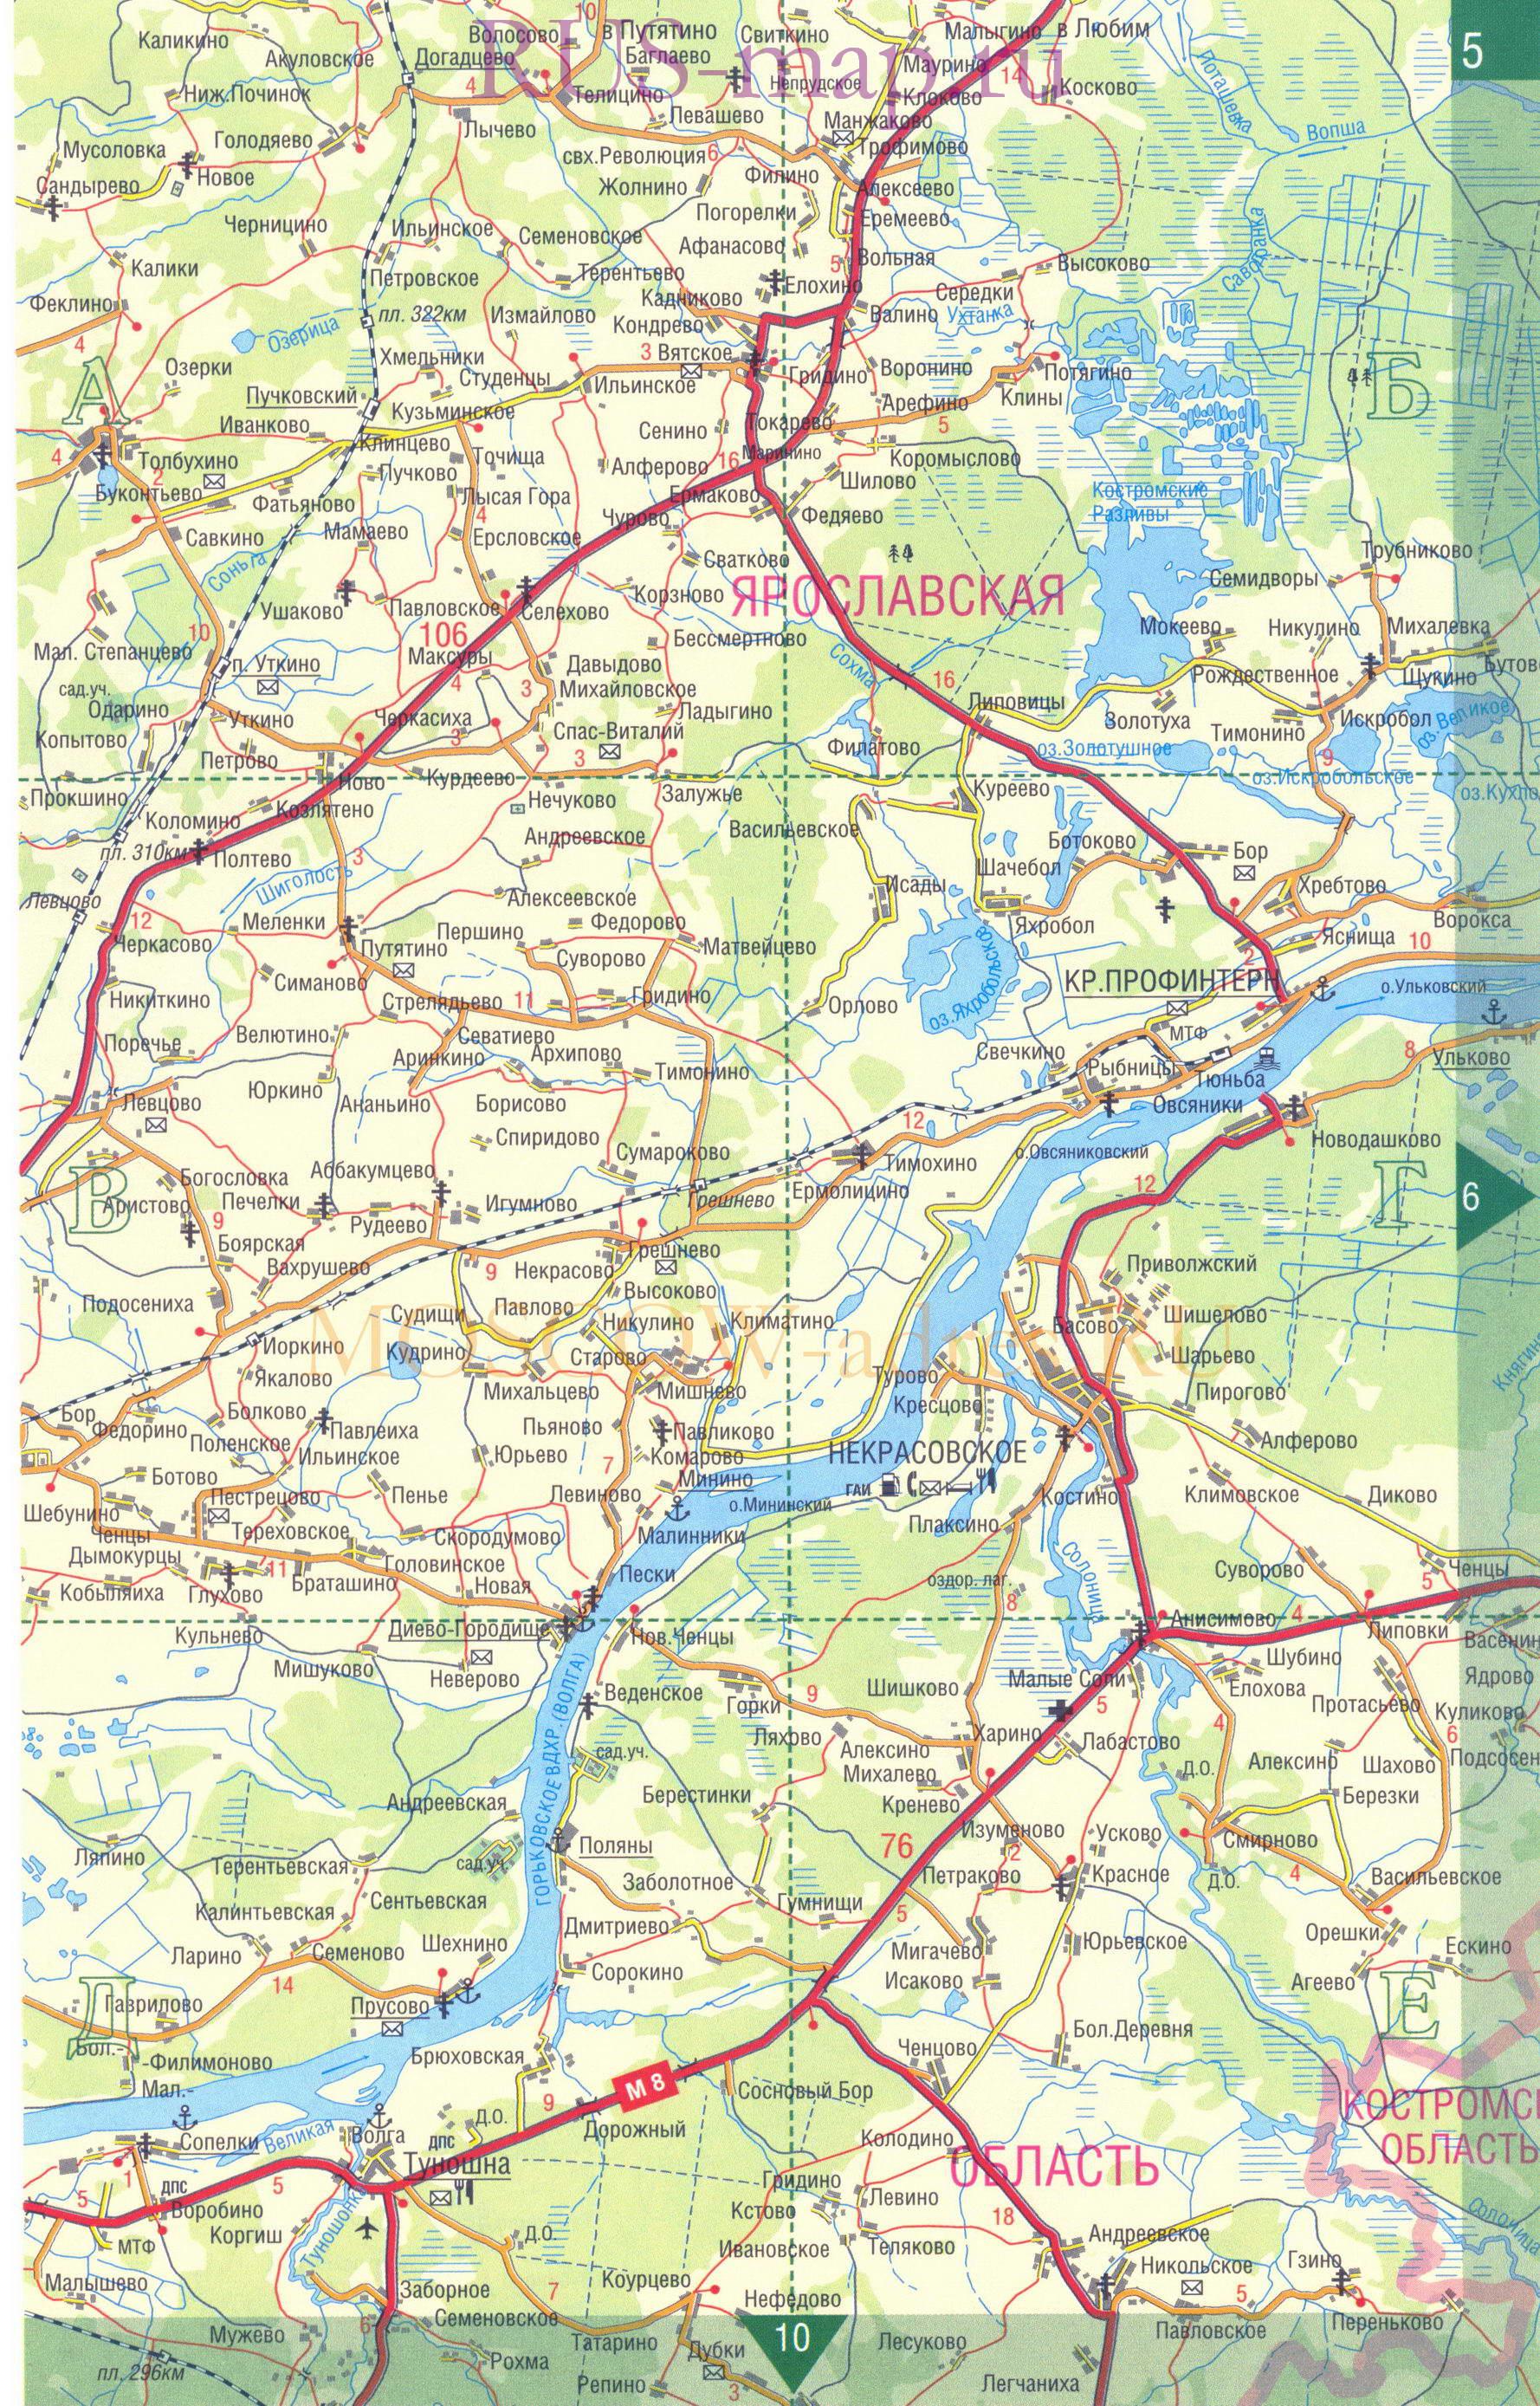 золотое кольцо россии на карте